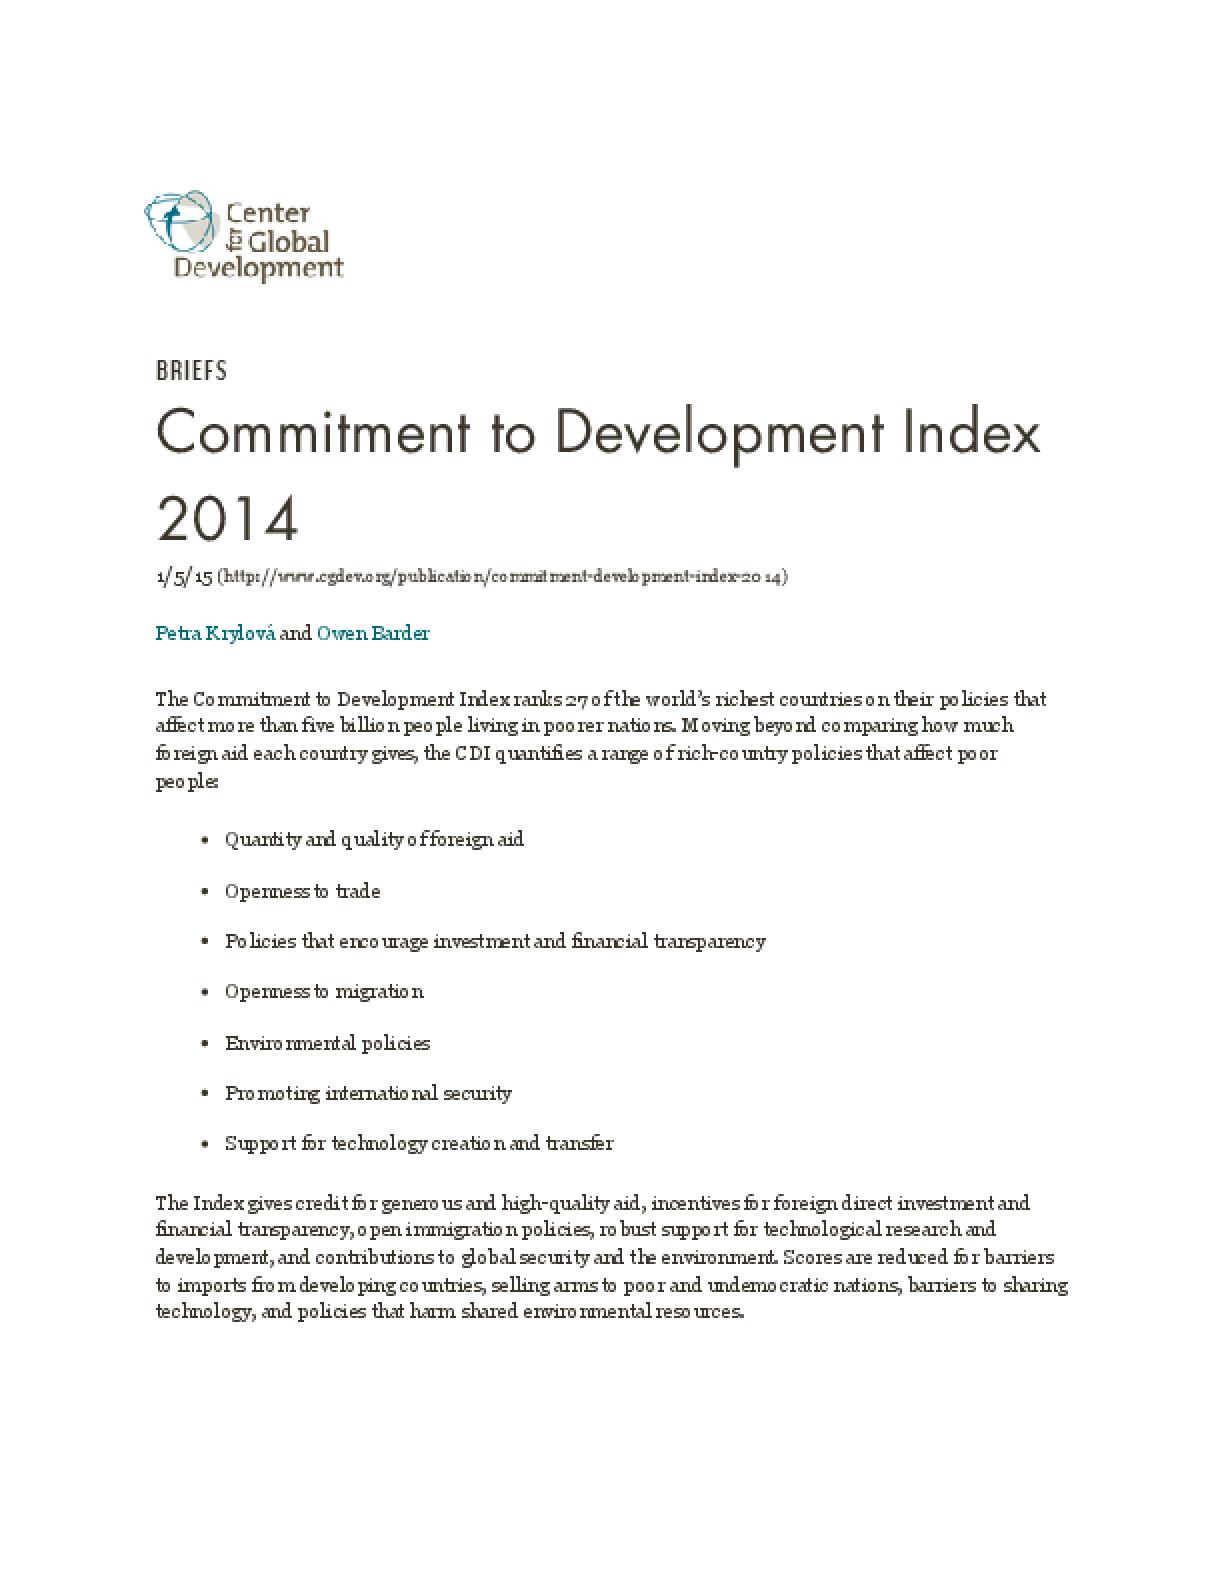 Commitment to Development Index 2014